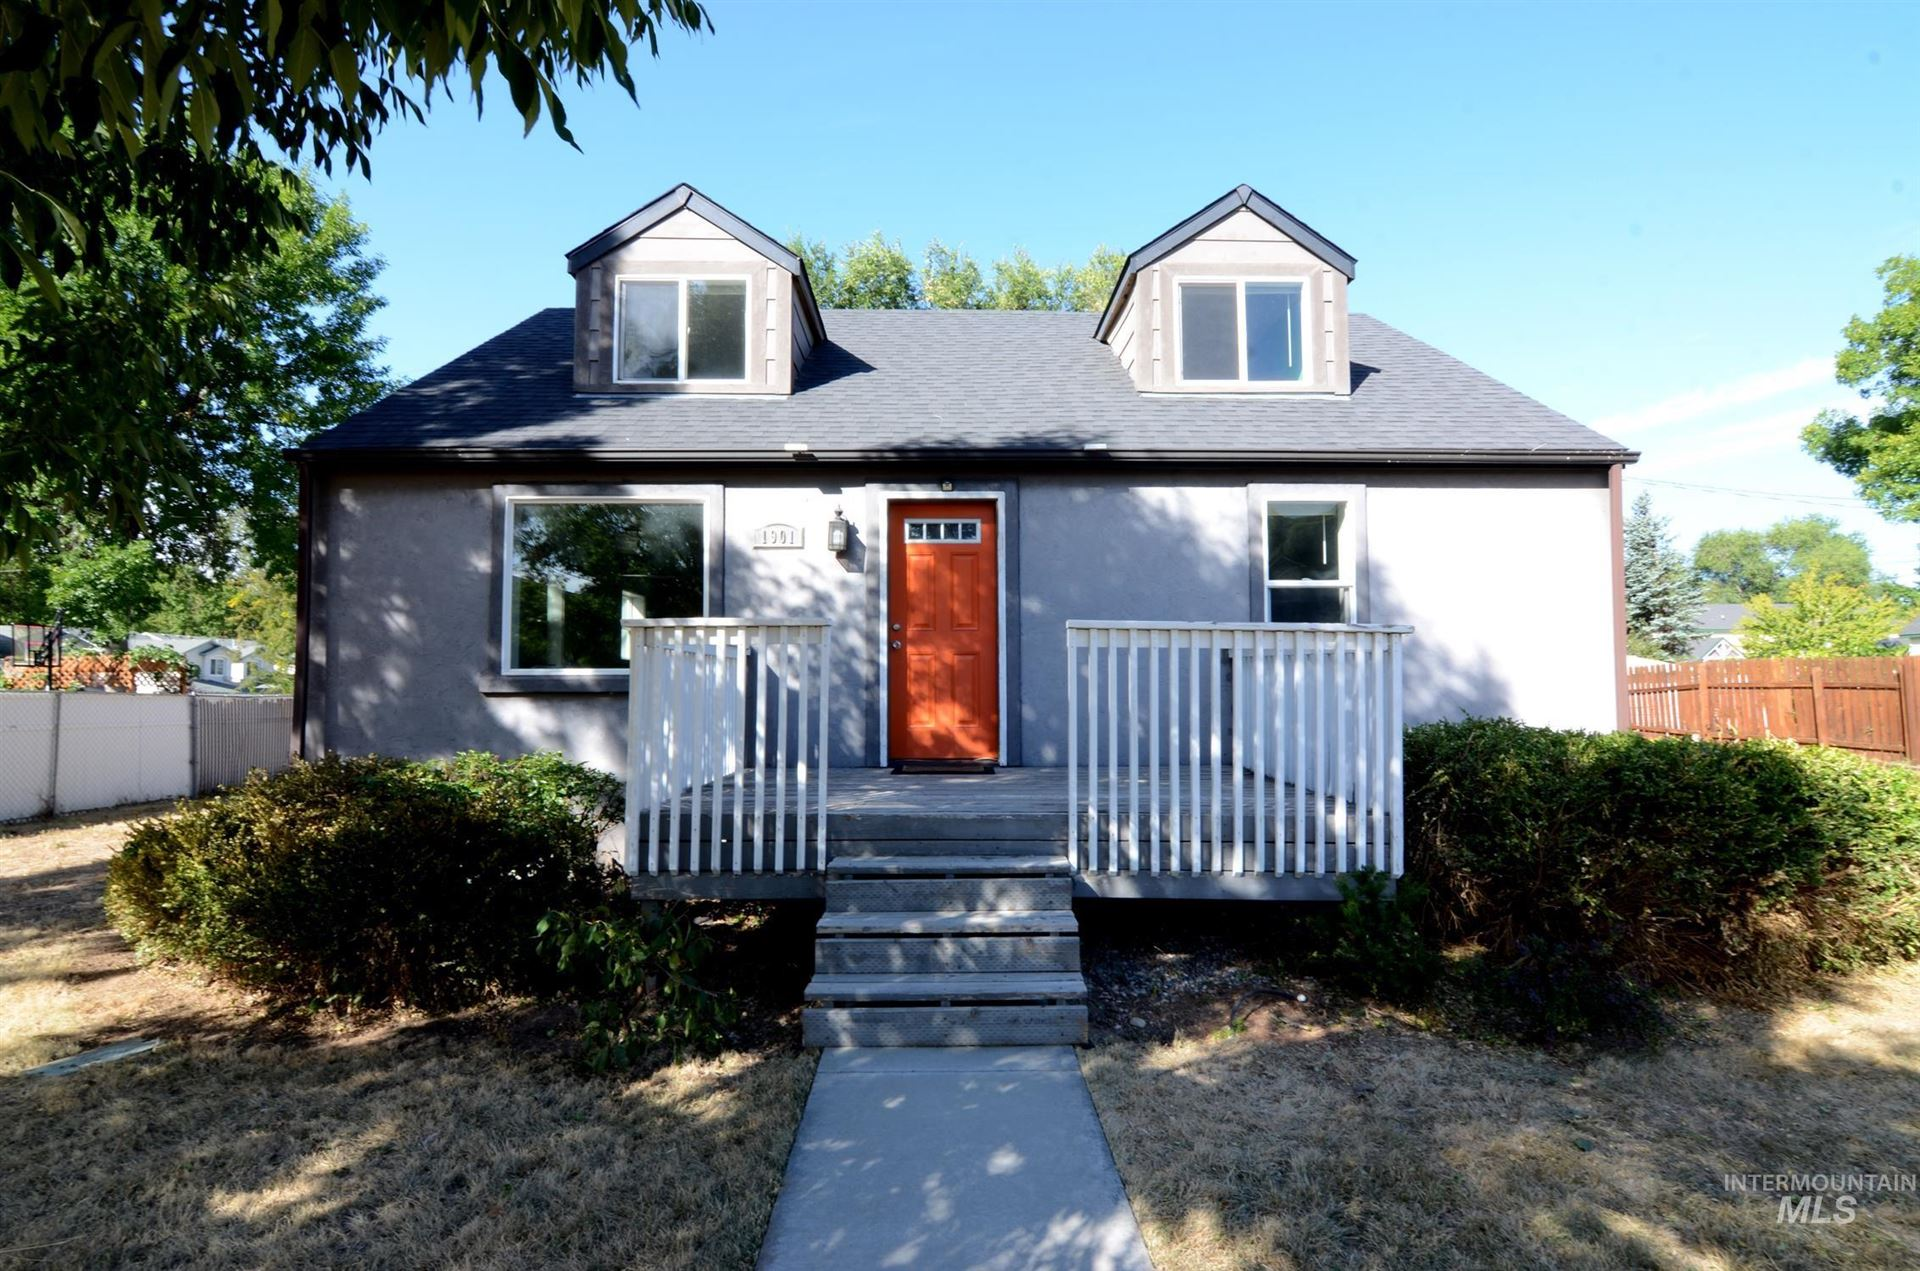 Photo of 1901 S Latah St, Boise, ID 83705 (MLS # 98819551)